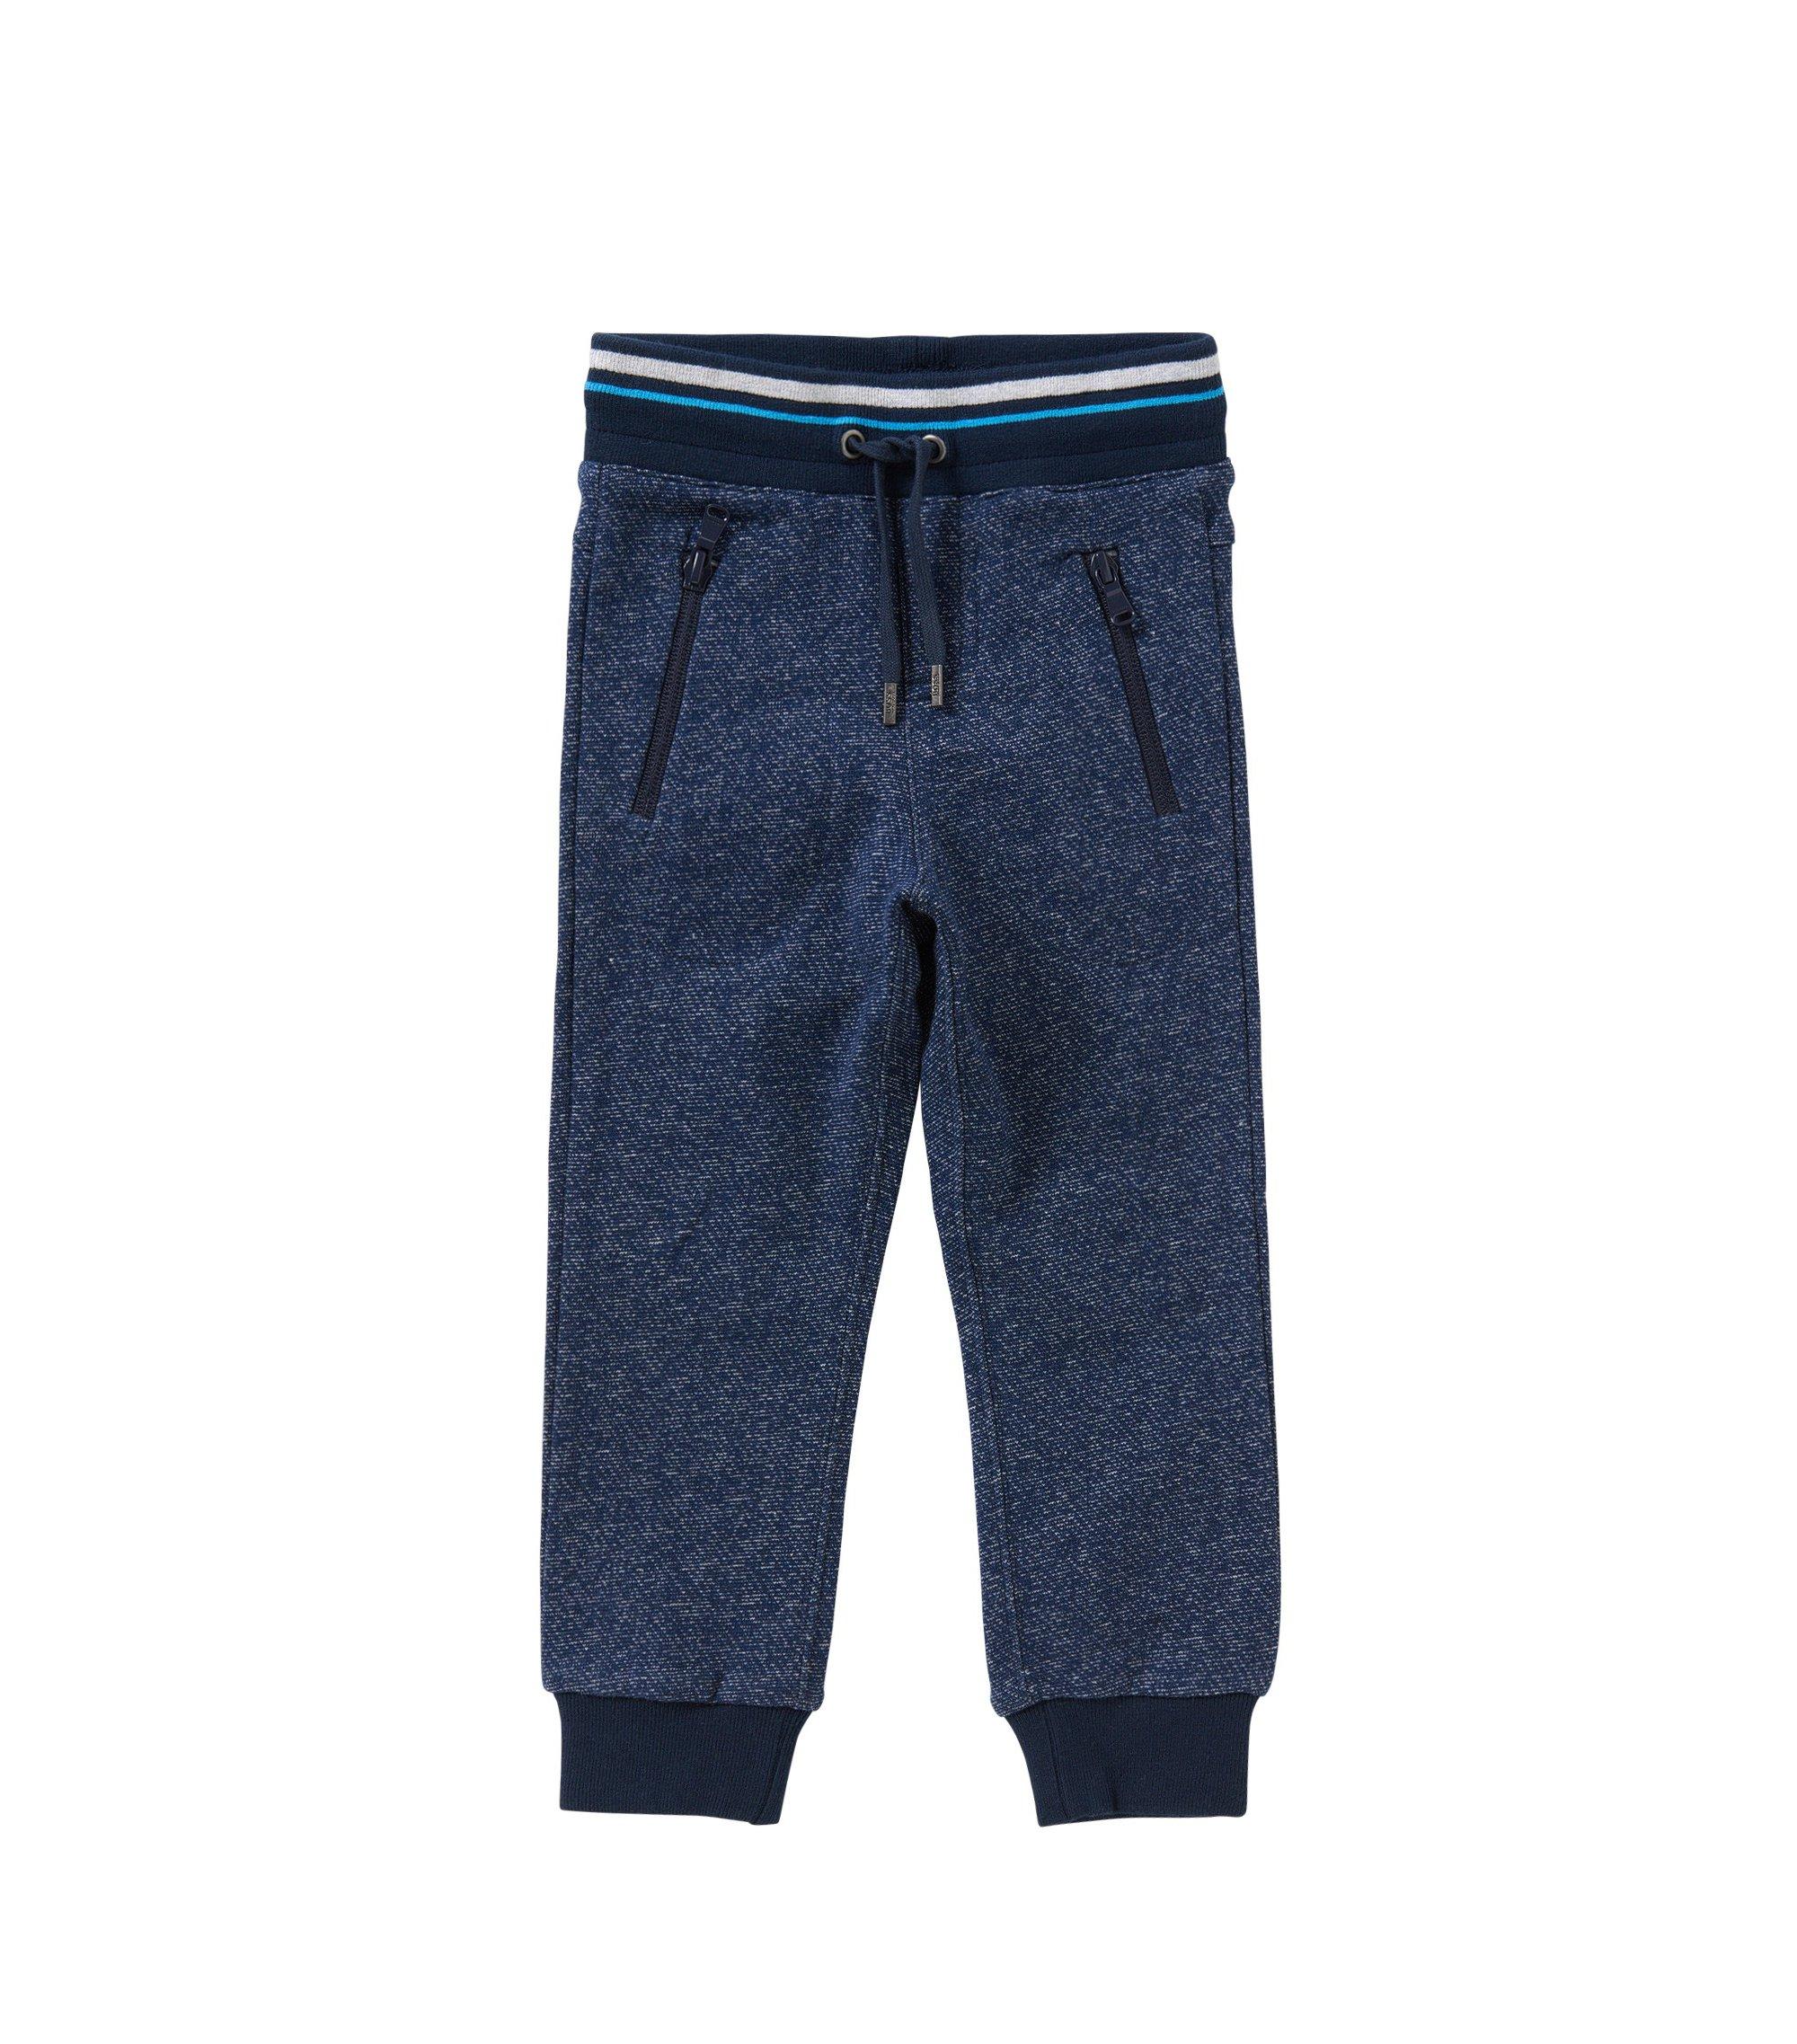 Kids-Sweathose aus Baumwolle mit Tunnelzugbund: 'J24392', Dunkelblau